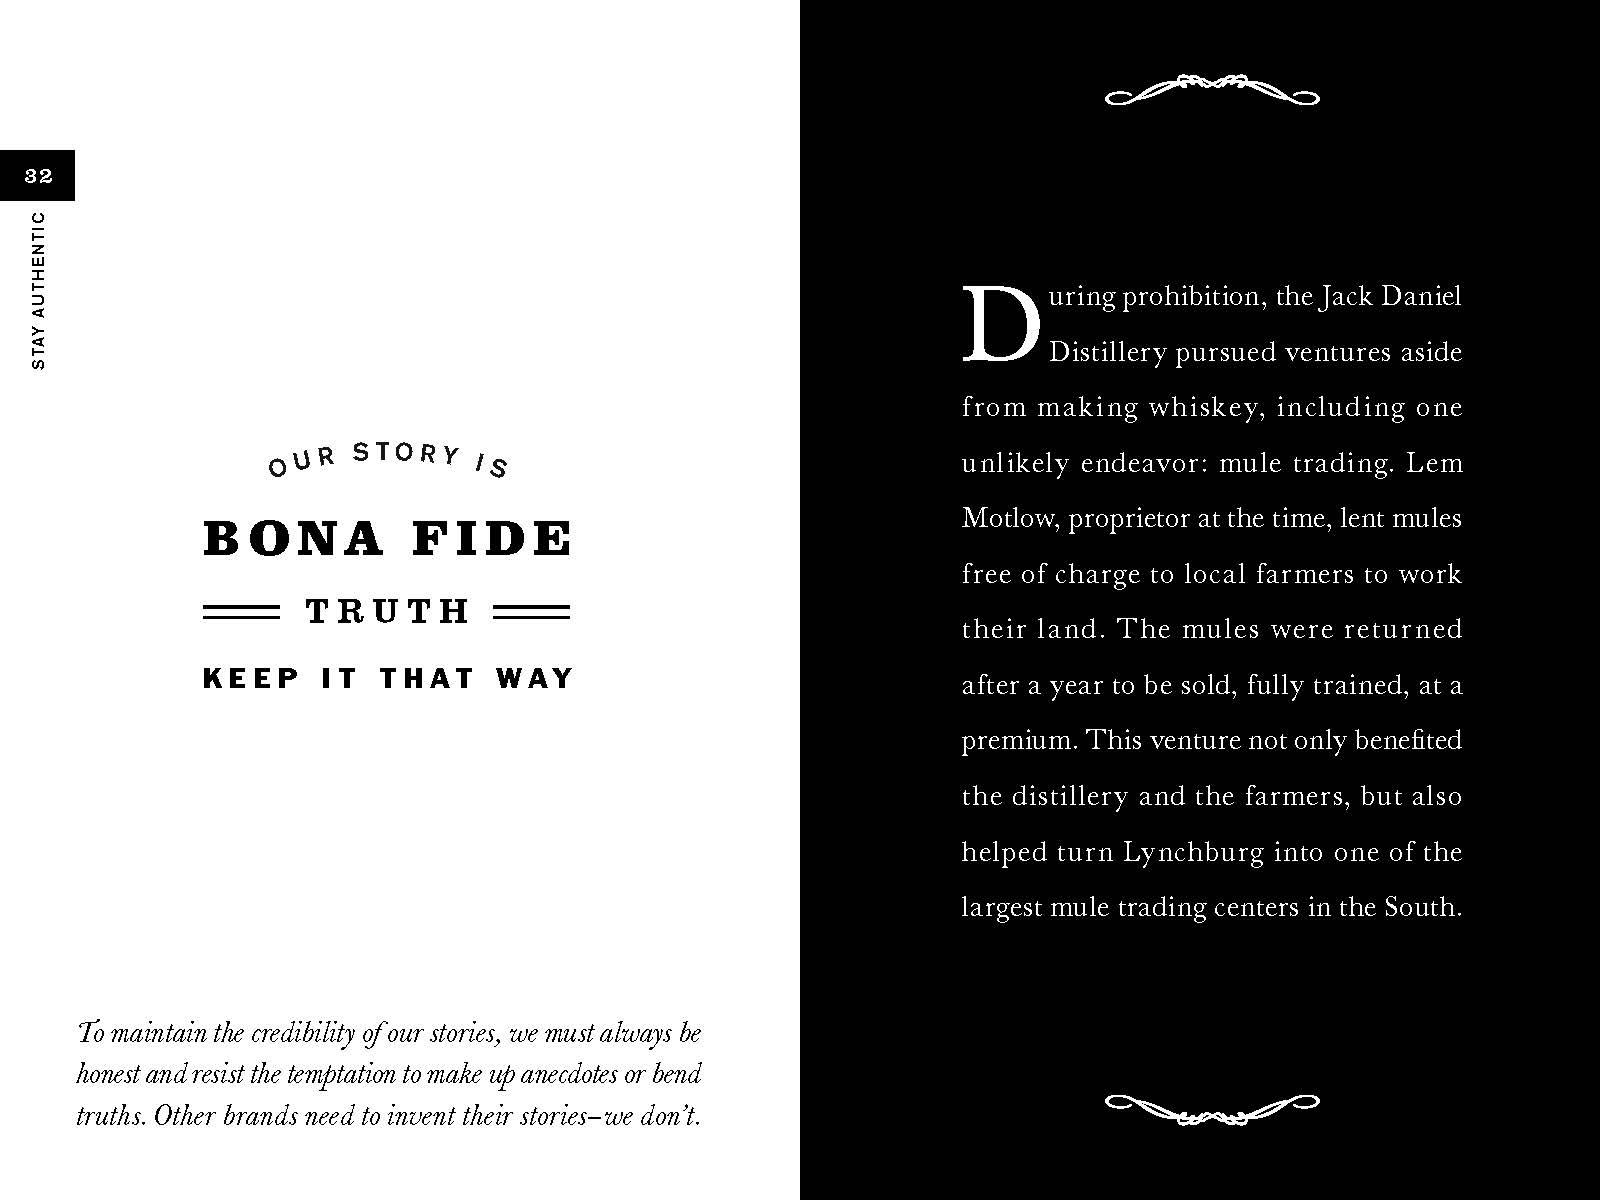 Jack Daniel's Guiding Principles 2012_Page_20.jpg